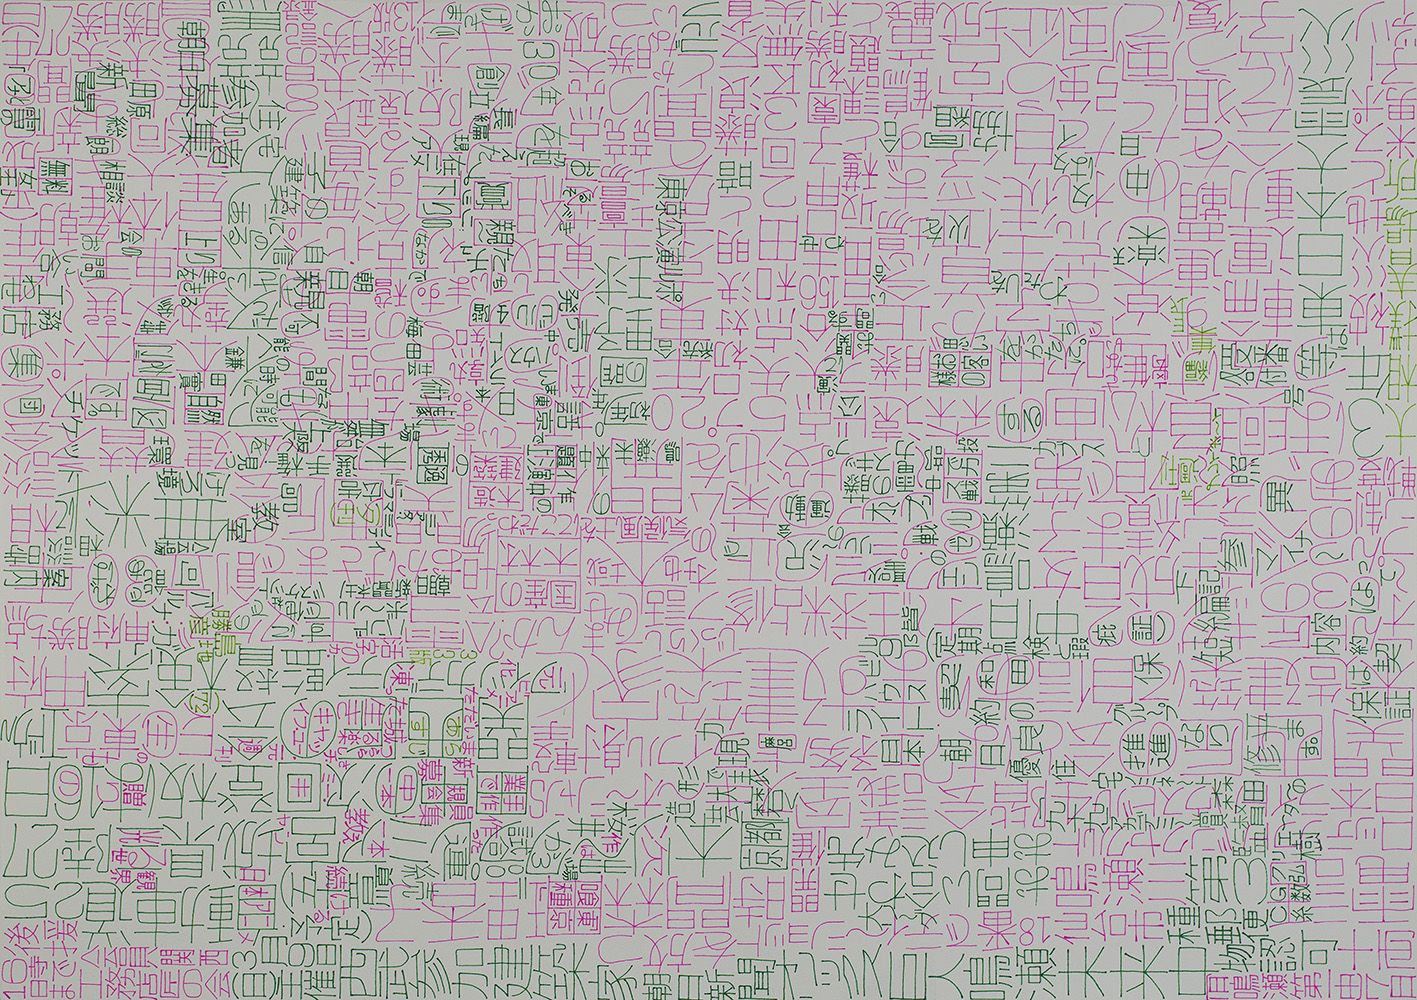 Yoshiyasu Hirano    Untitled   Ink on paper 21.5 x 30 inches 54.6 x 76.2 cm YHi 2